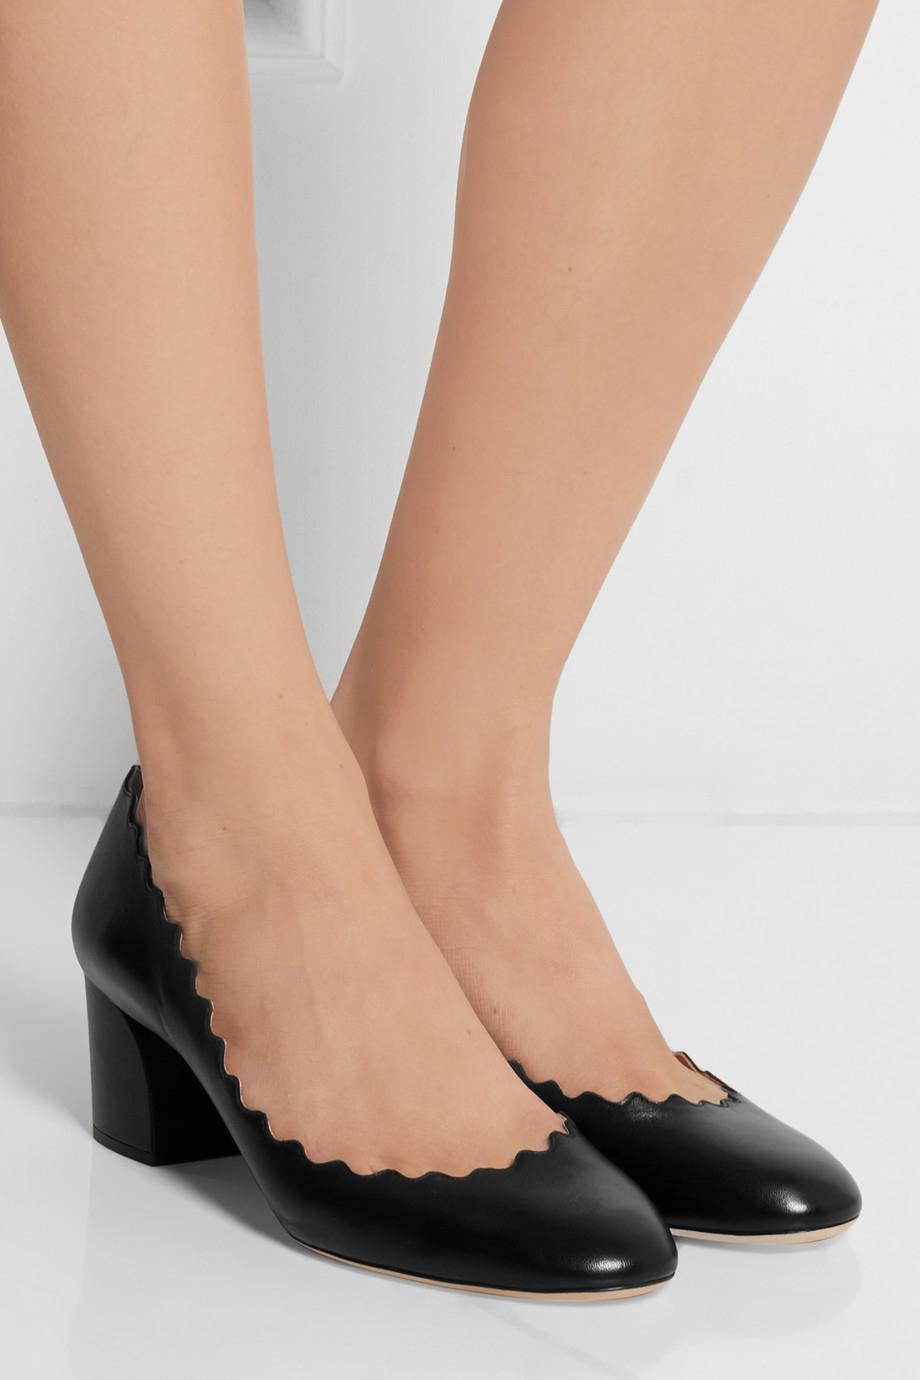 0d60ba558765 Lyst - Chloé Laura Scallop Pumps in Black